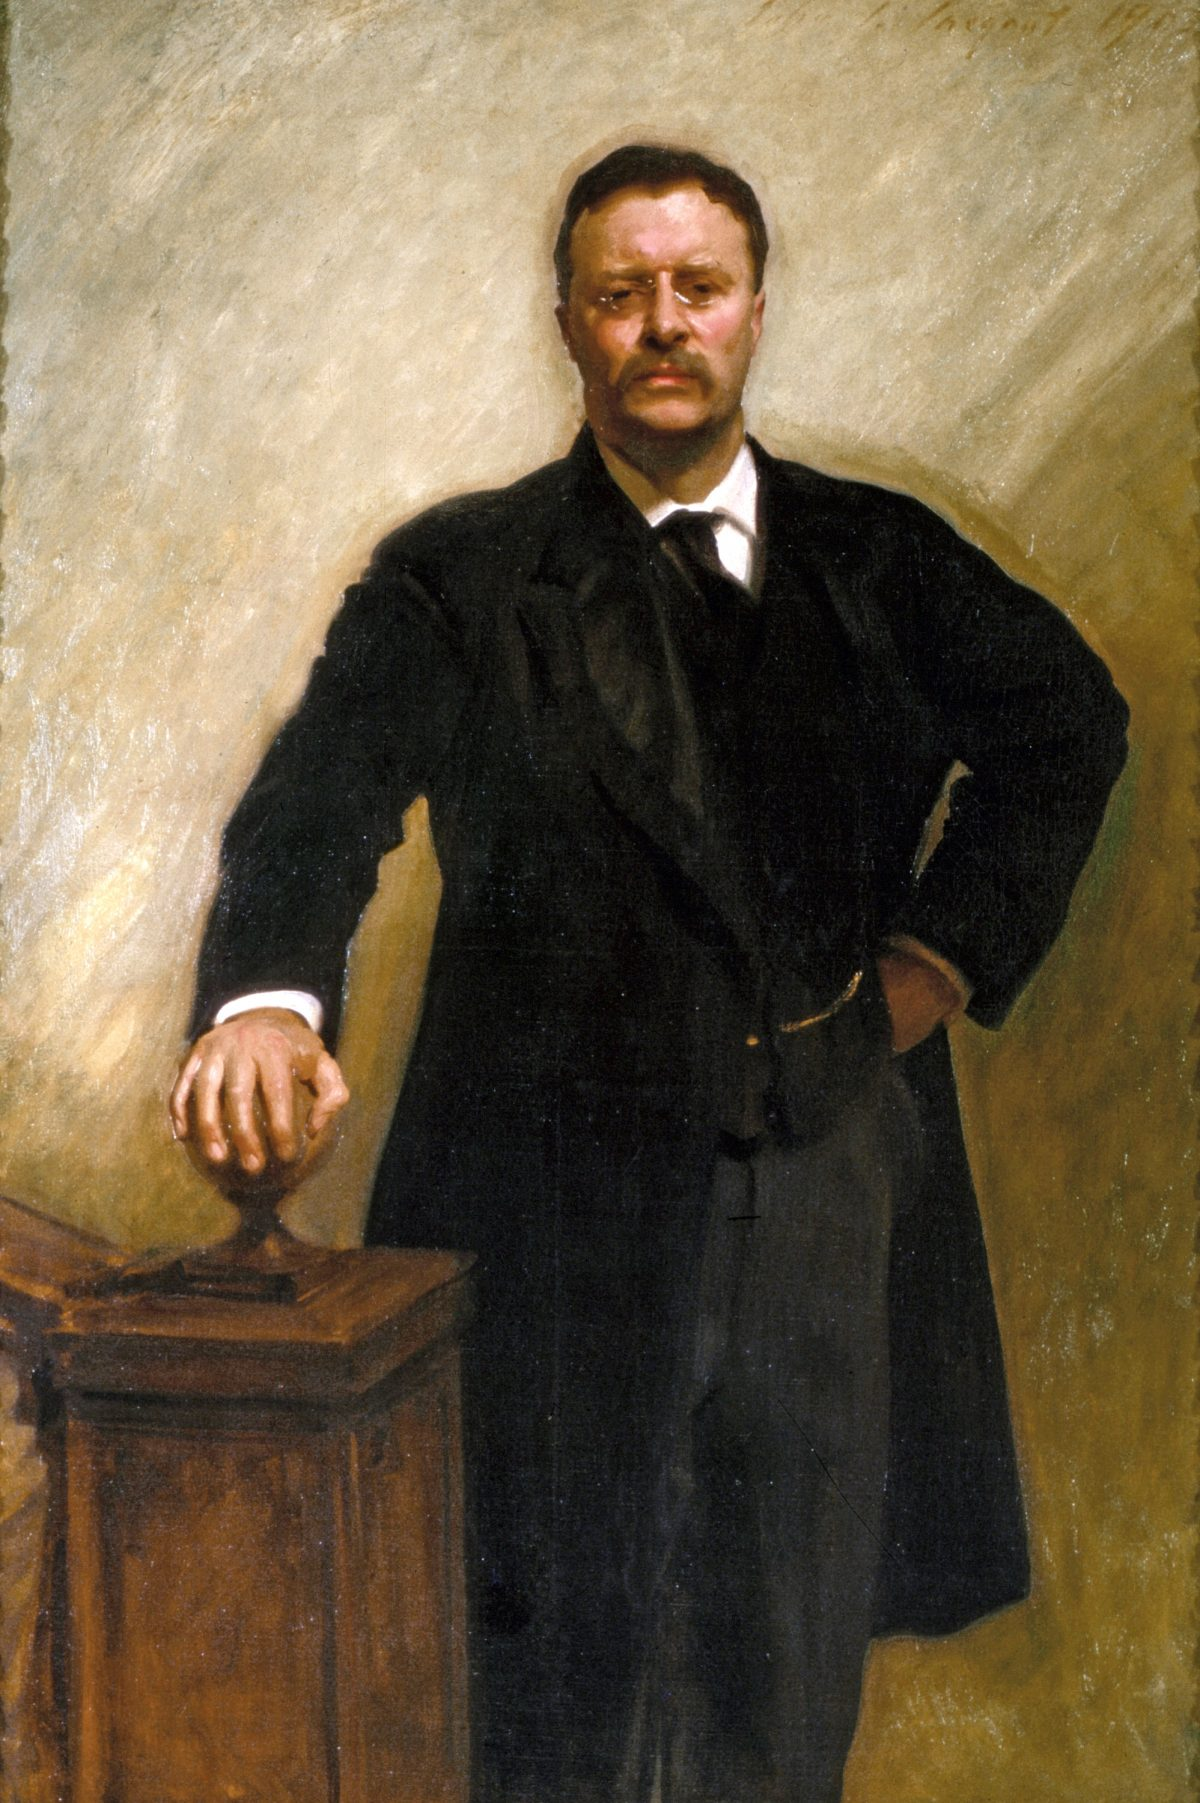 Theodore_Roosevelt_by_John_Singer_Sargent,_1903